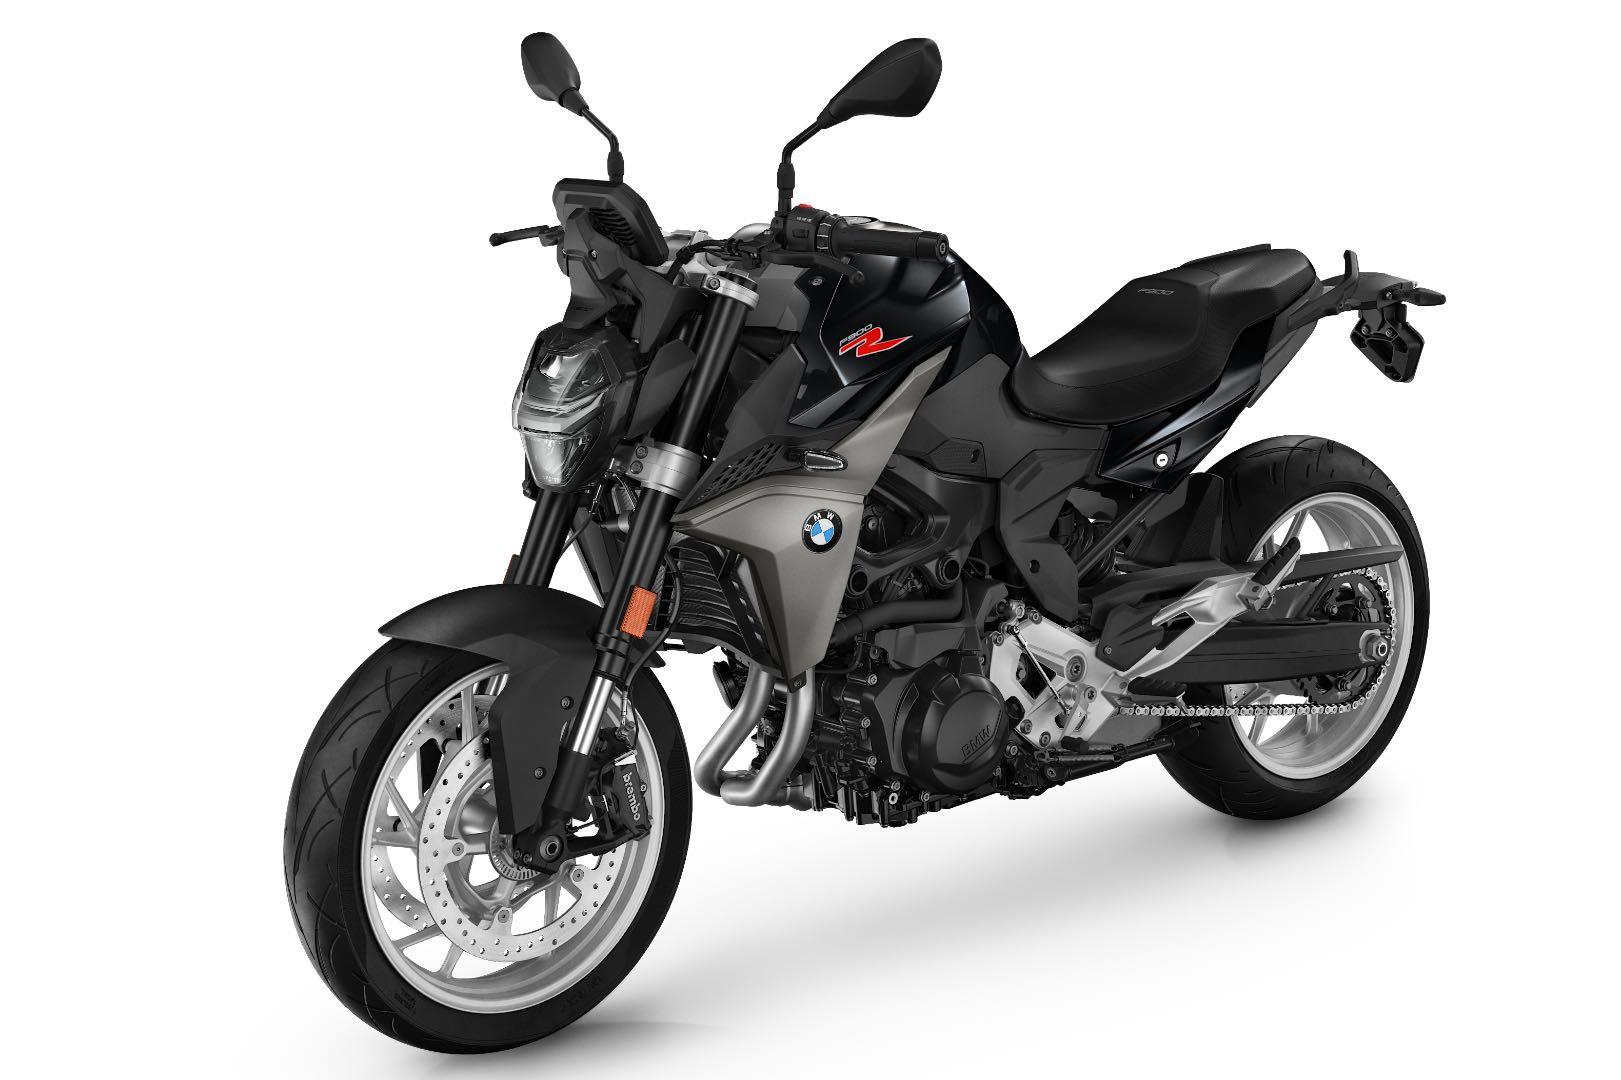 F 900 R BMW for sale